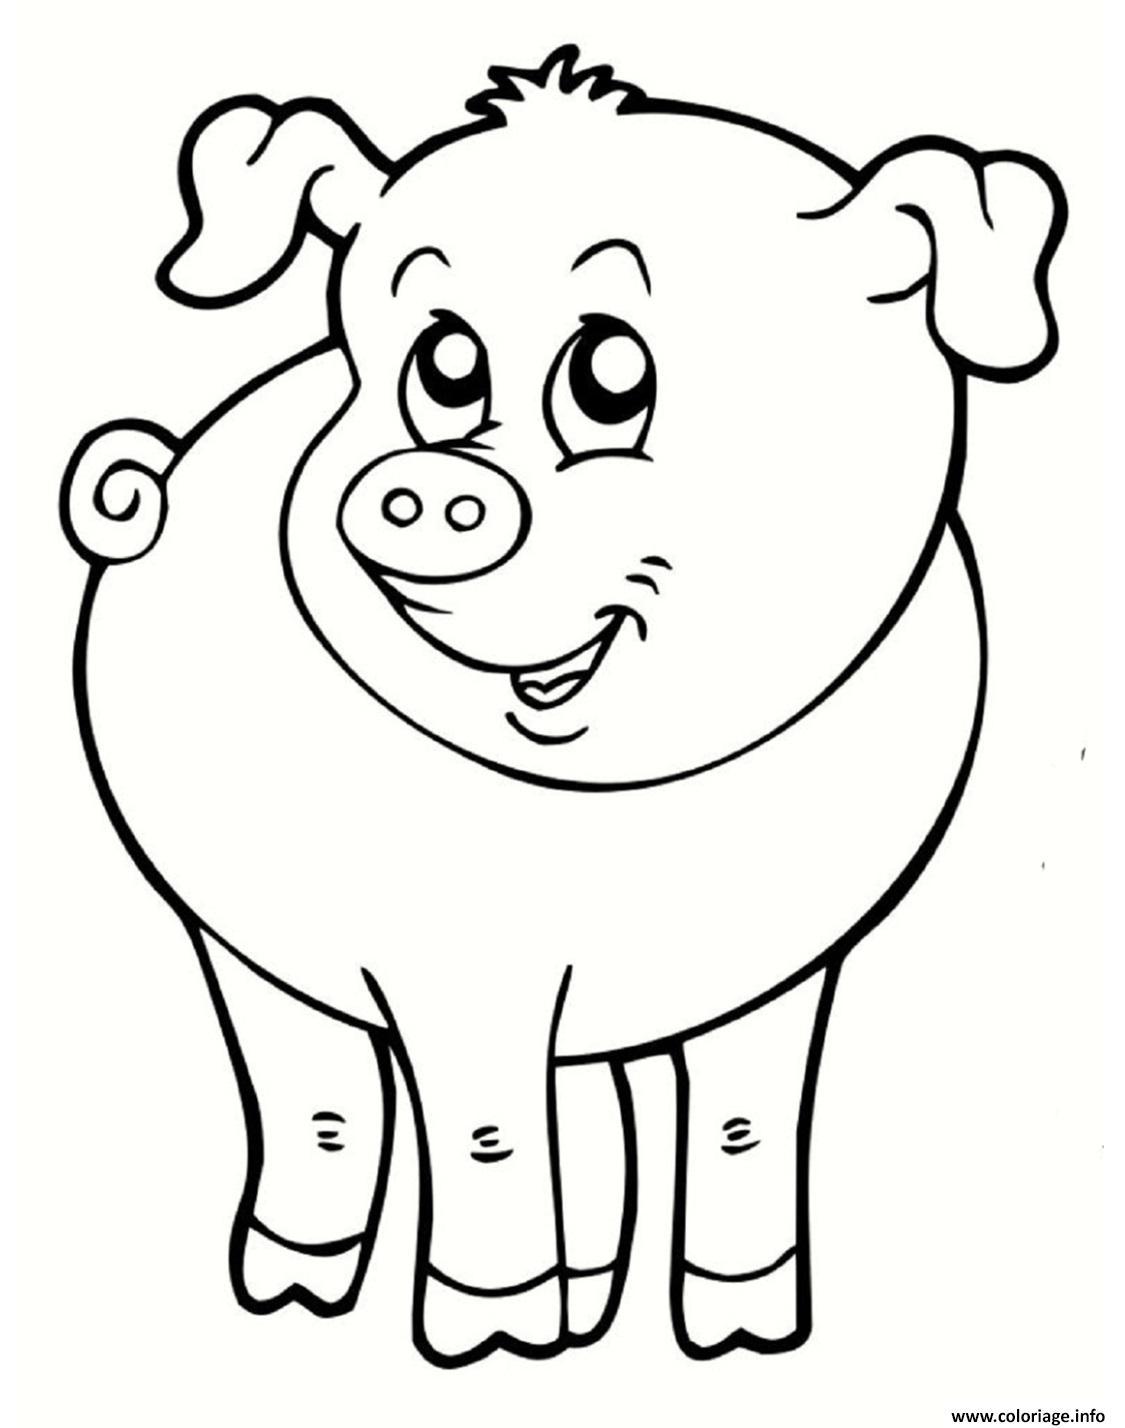 Coloriage cochon souriant animal de la ferme dessin - Cochon a dessiner ...